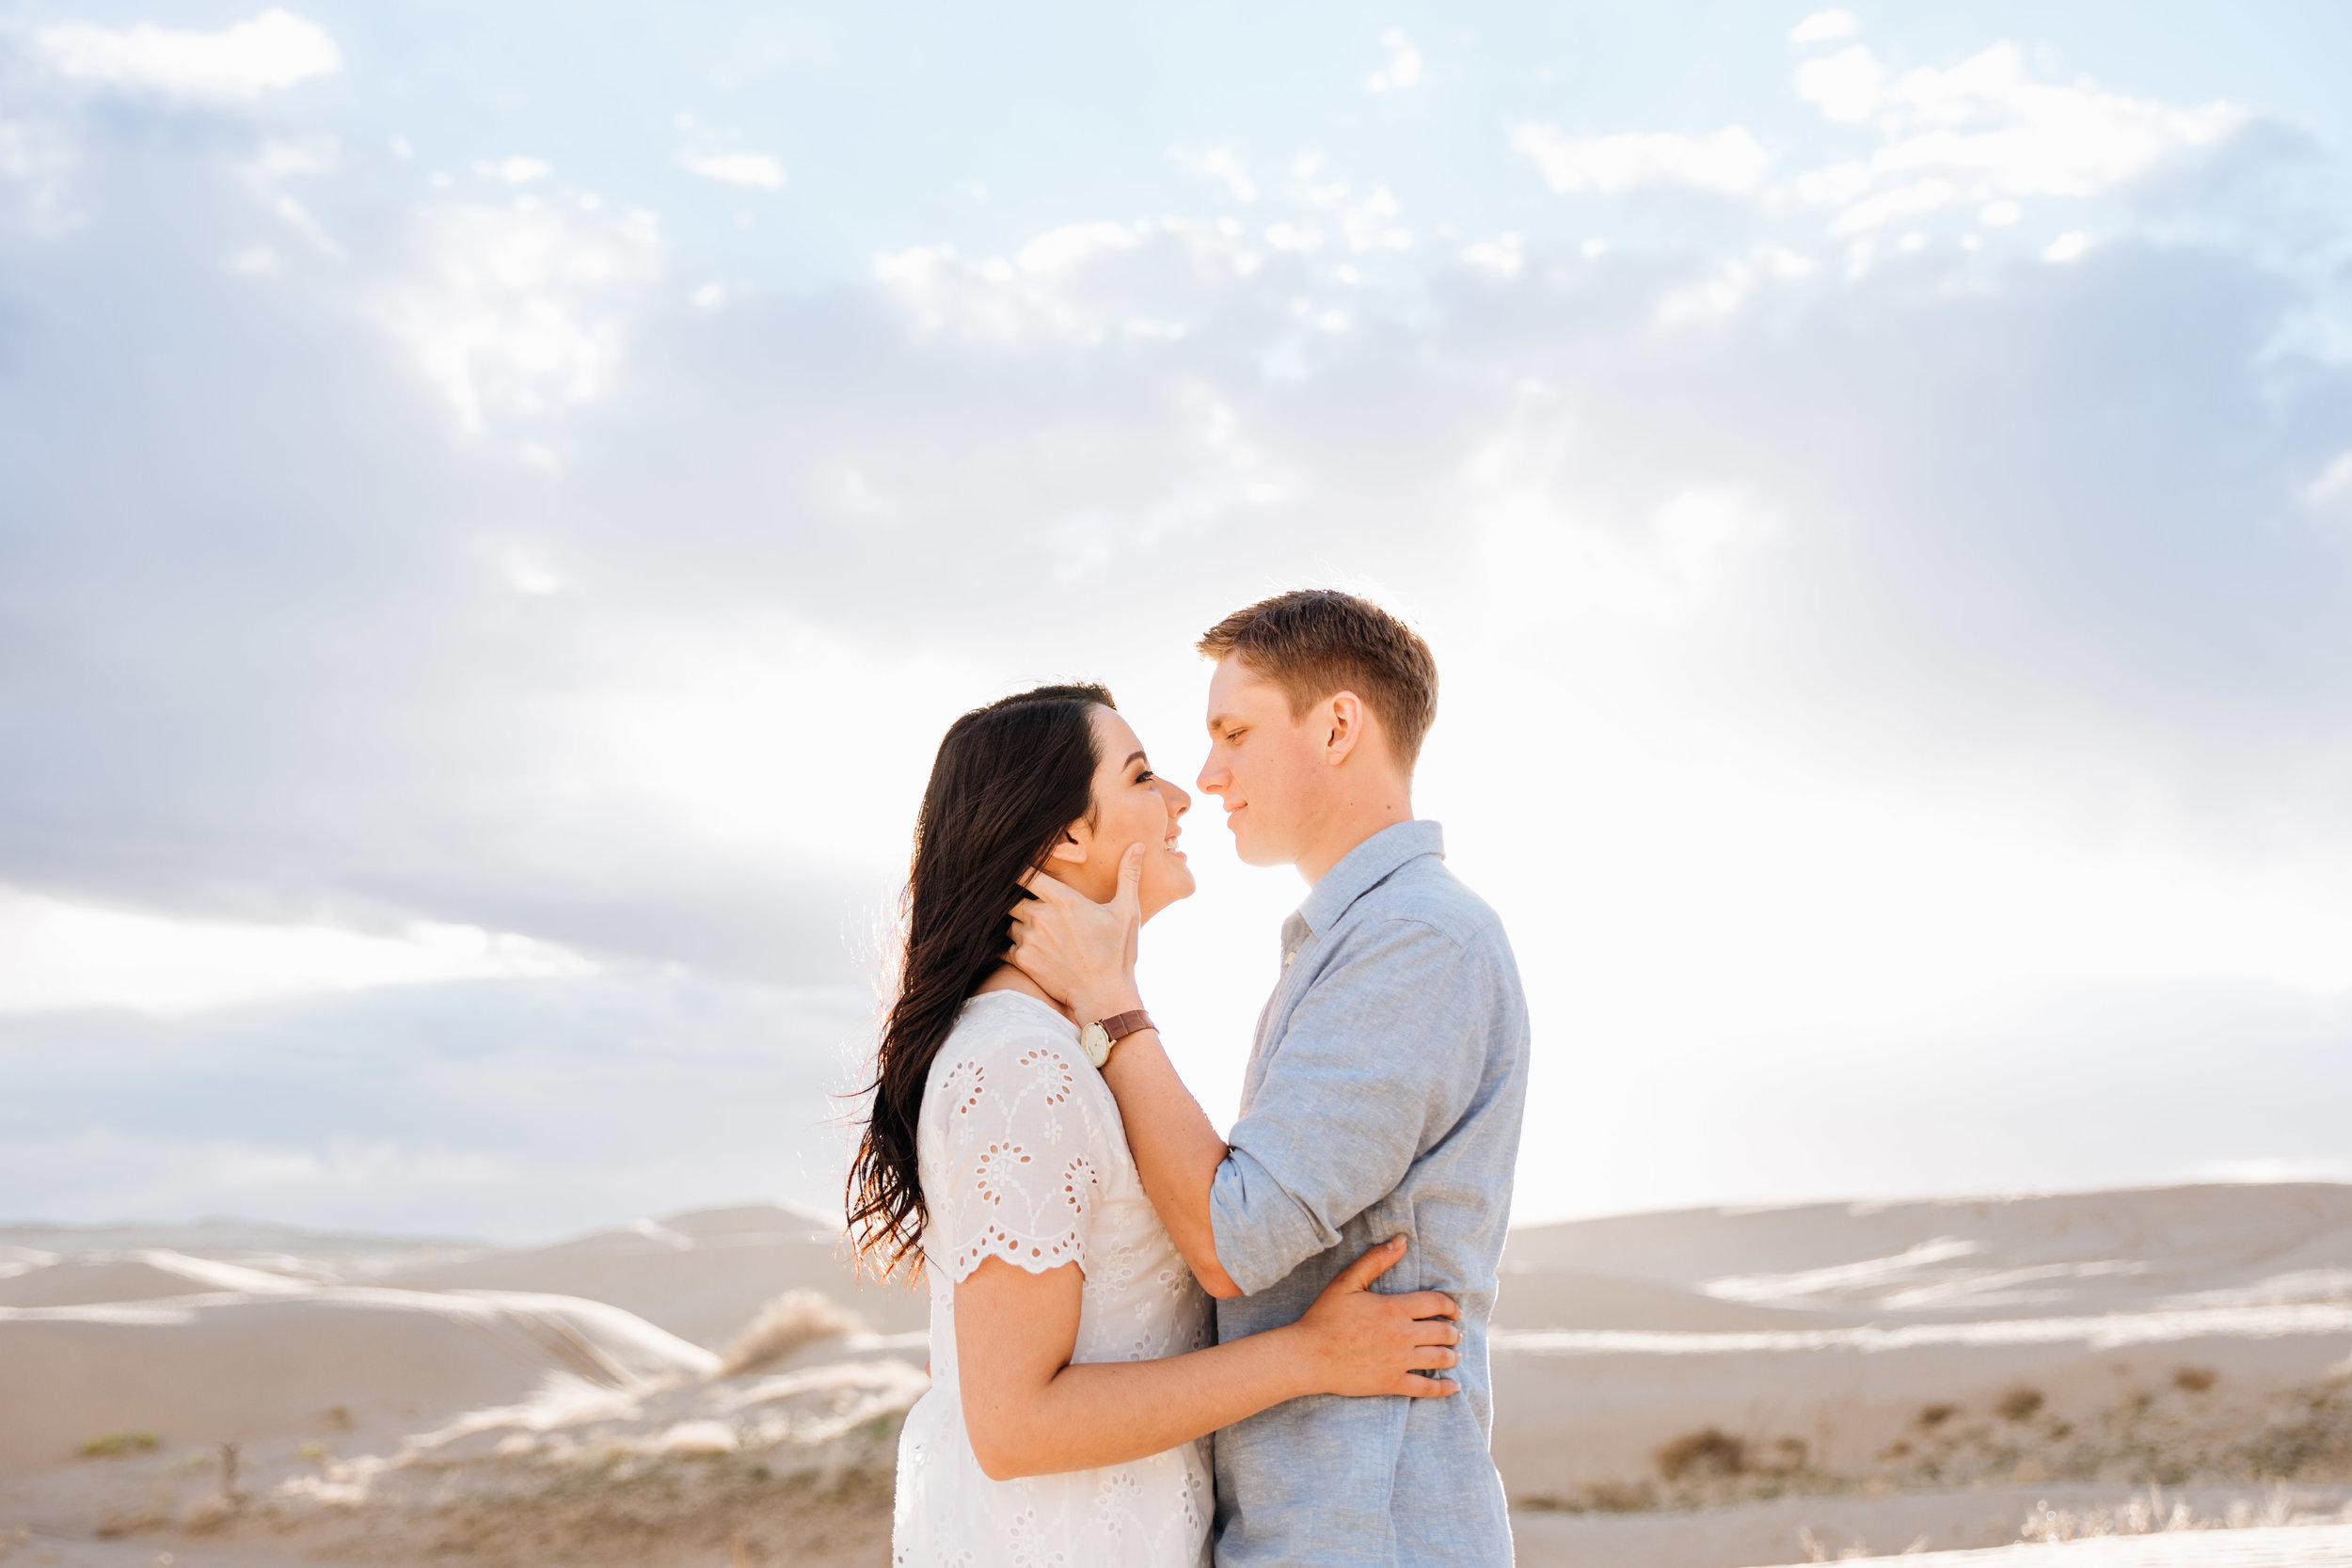 little-sahara-recreation-area-elopement-engagement-wedding-photography-michael-cozzens-54.jpg